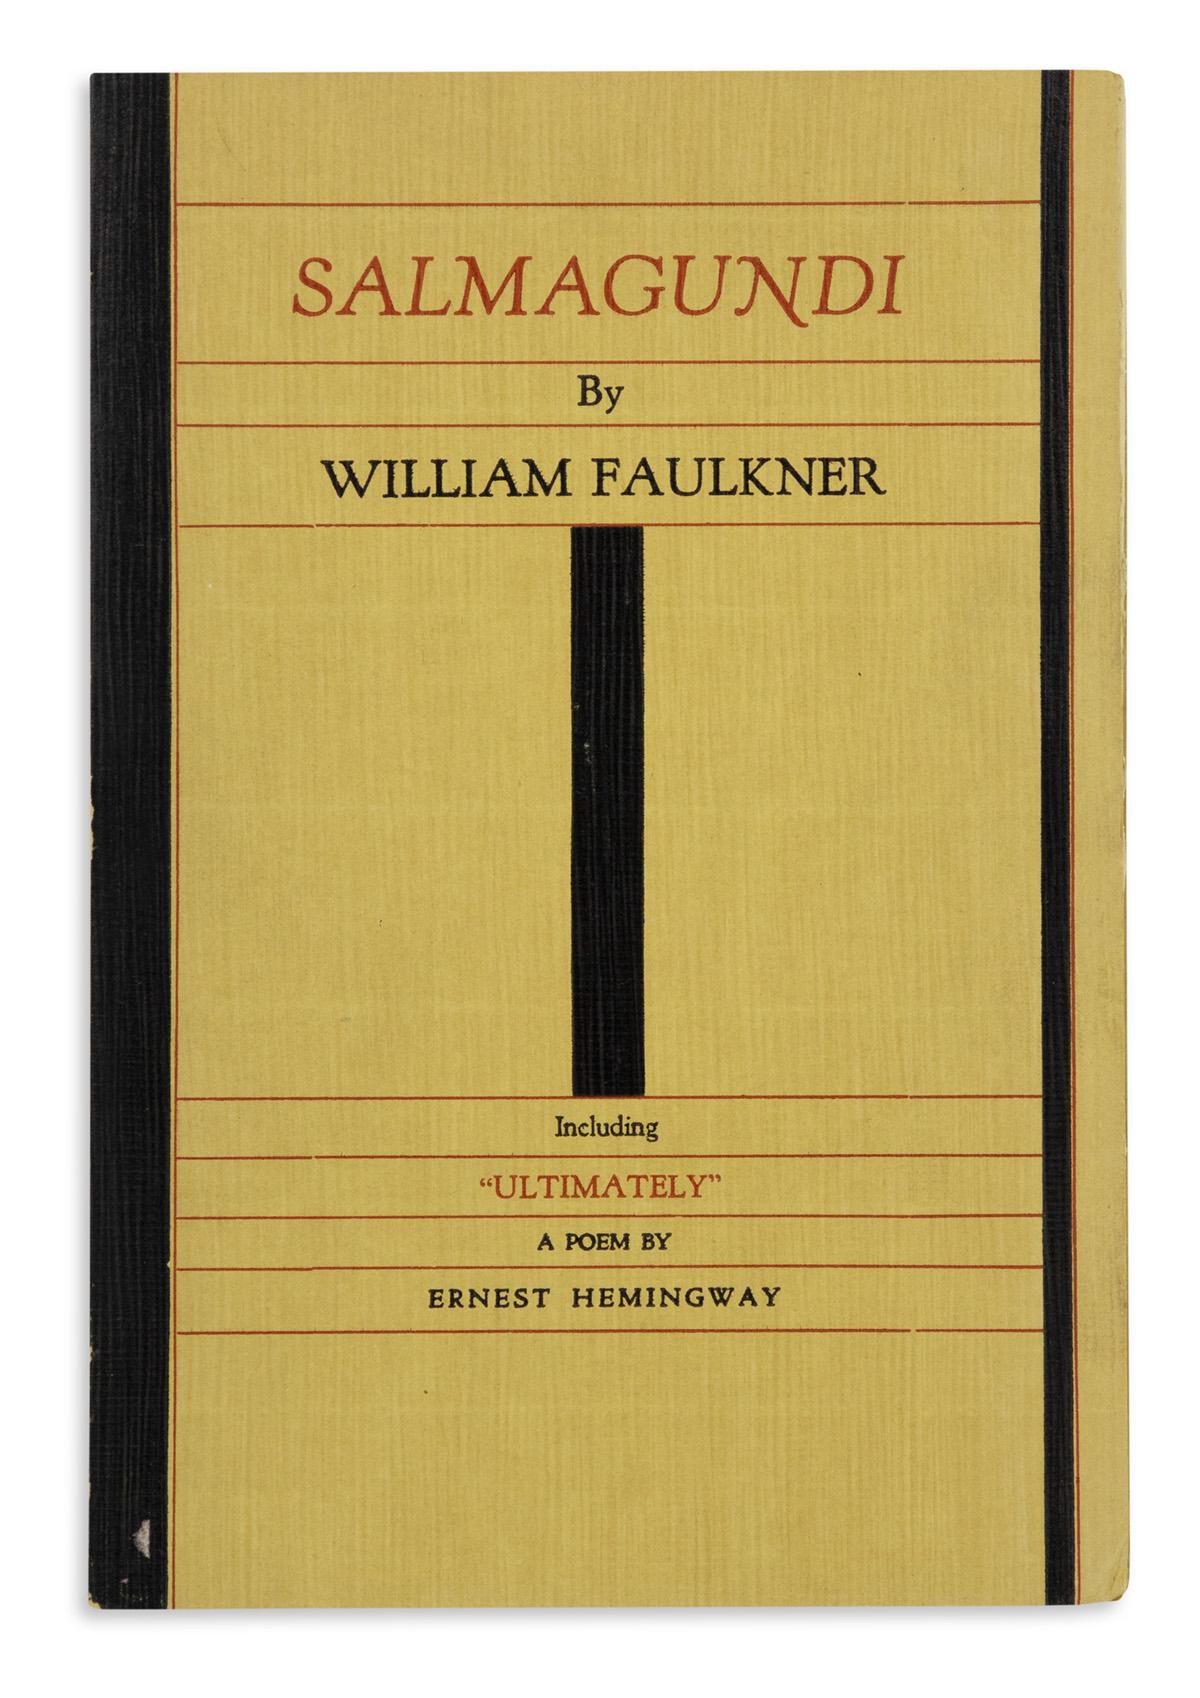 FAULKNER-WILLIAM-Salmagundi-and-a-Poem-by-Ernest-Hemingway